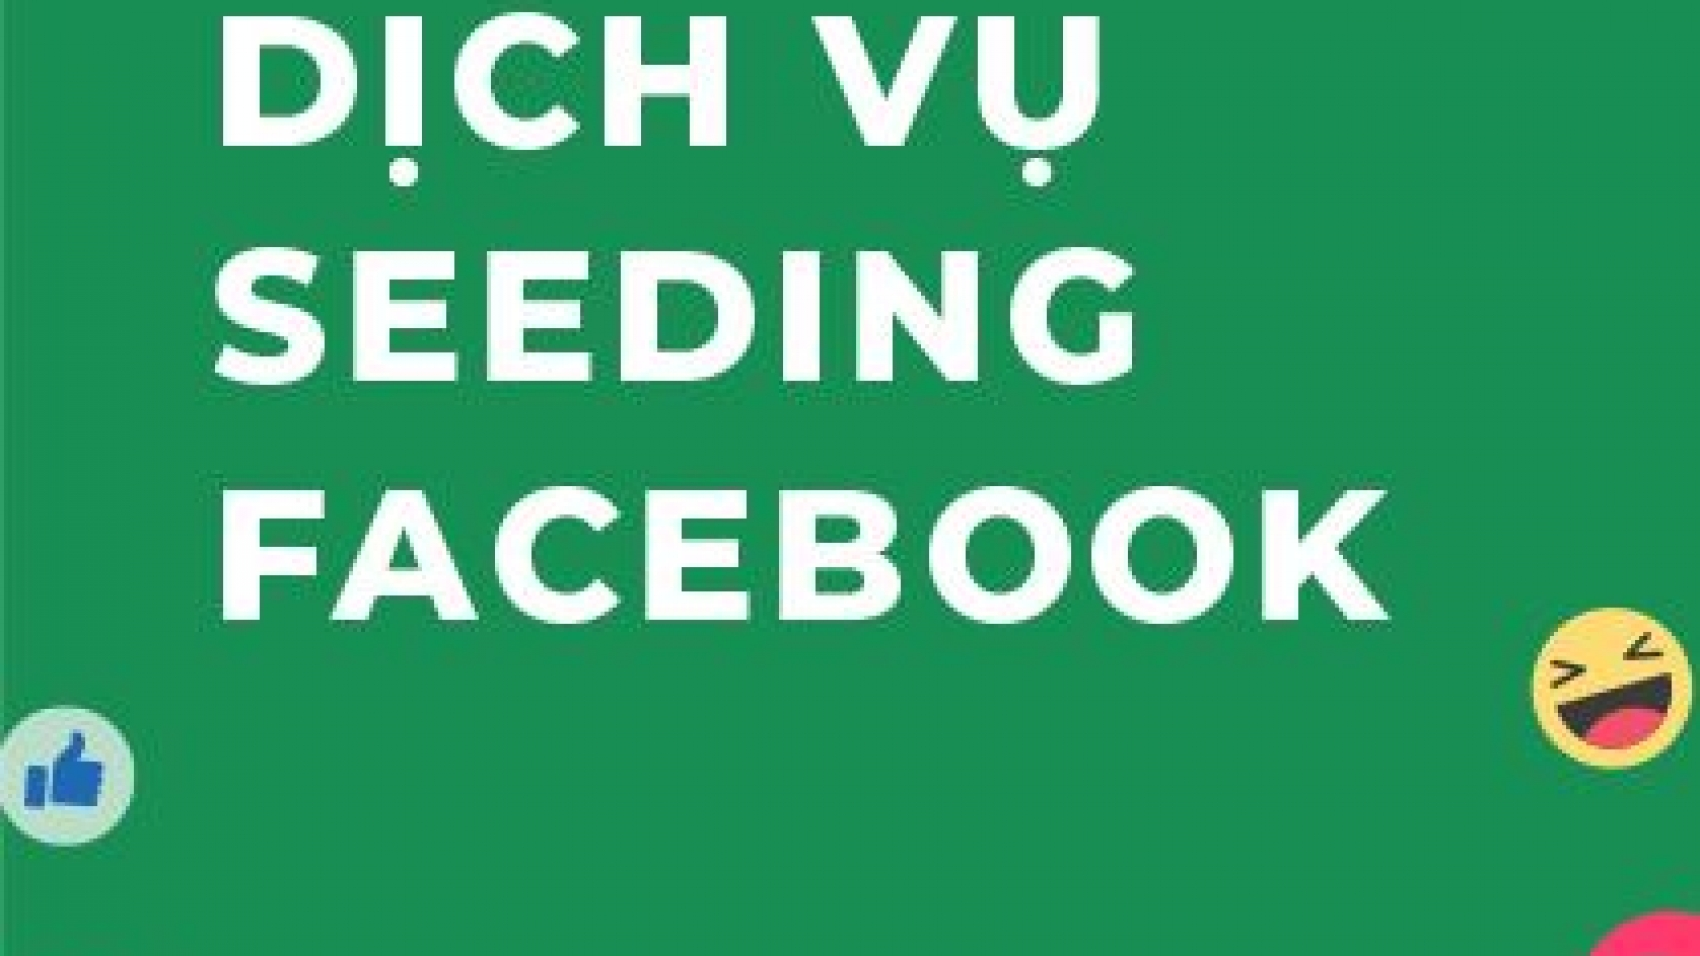 Khuyến mãi dịch vụ seeding facebook của Tigobiz